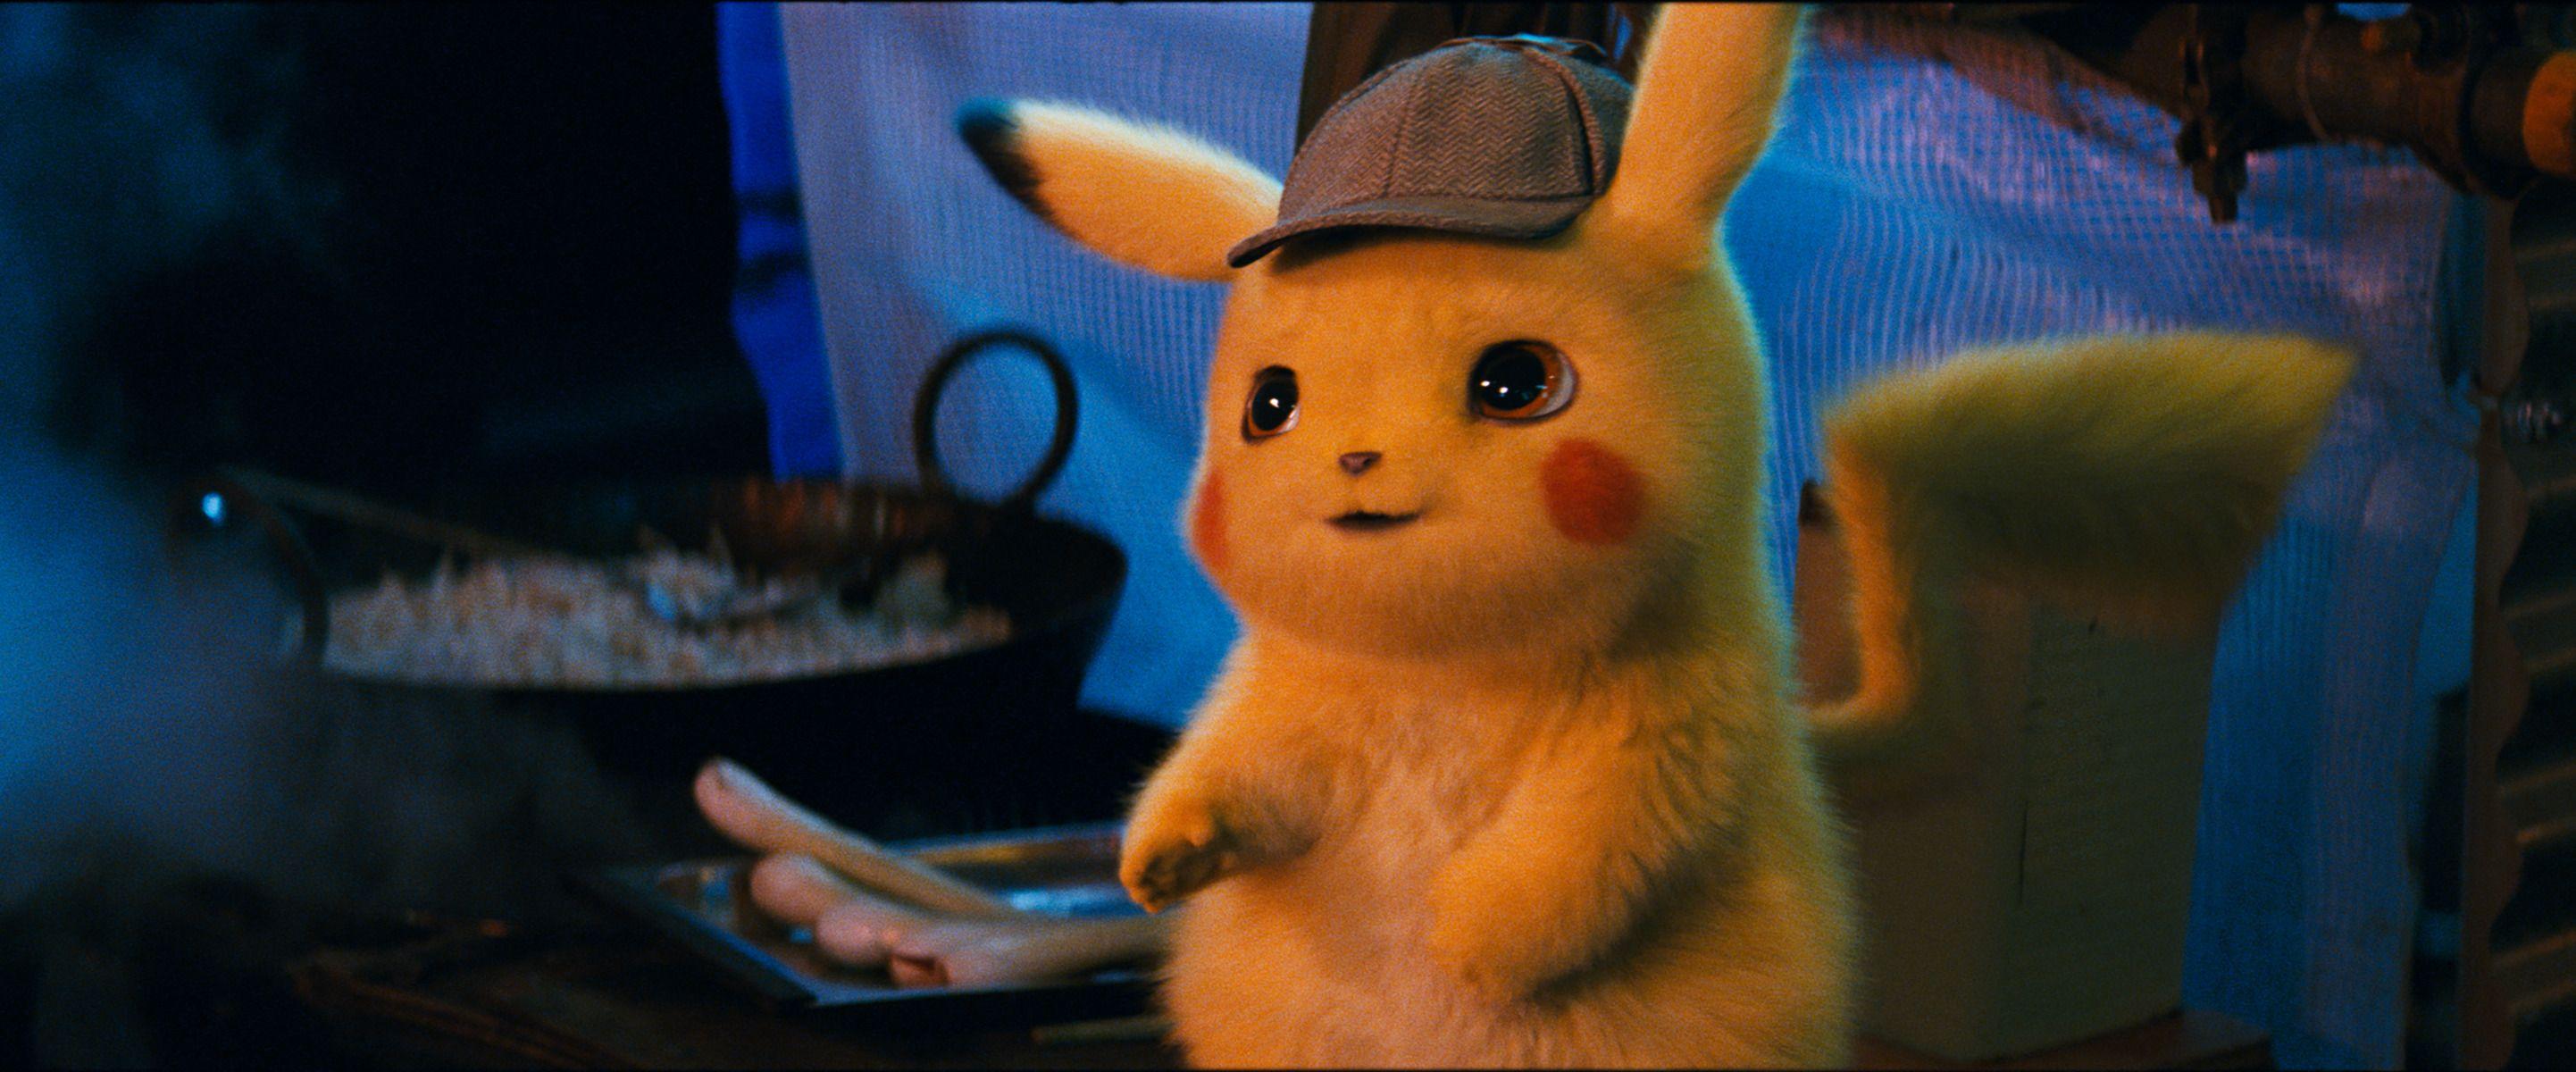 http://cdn.collider.com/wp-content/uploads/2019/04/detective-pikachu-smiling.jpeg